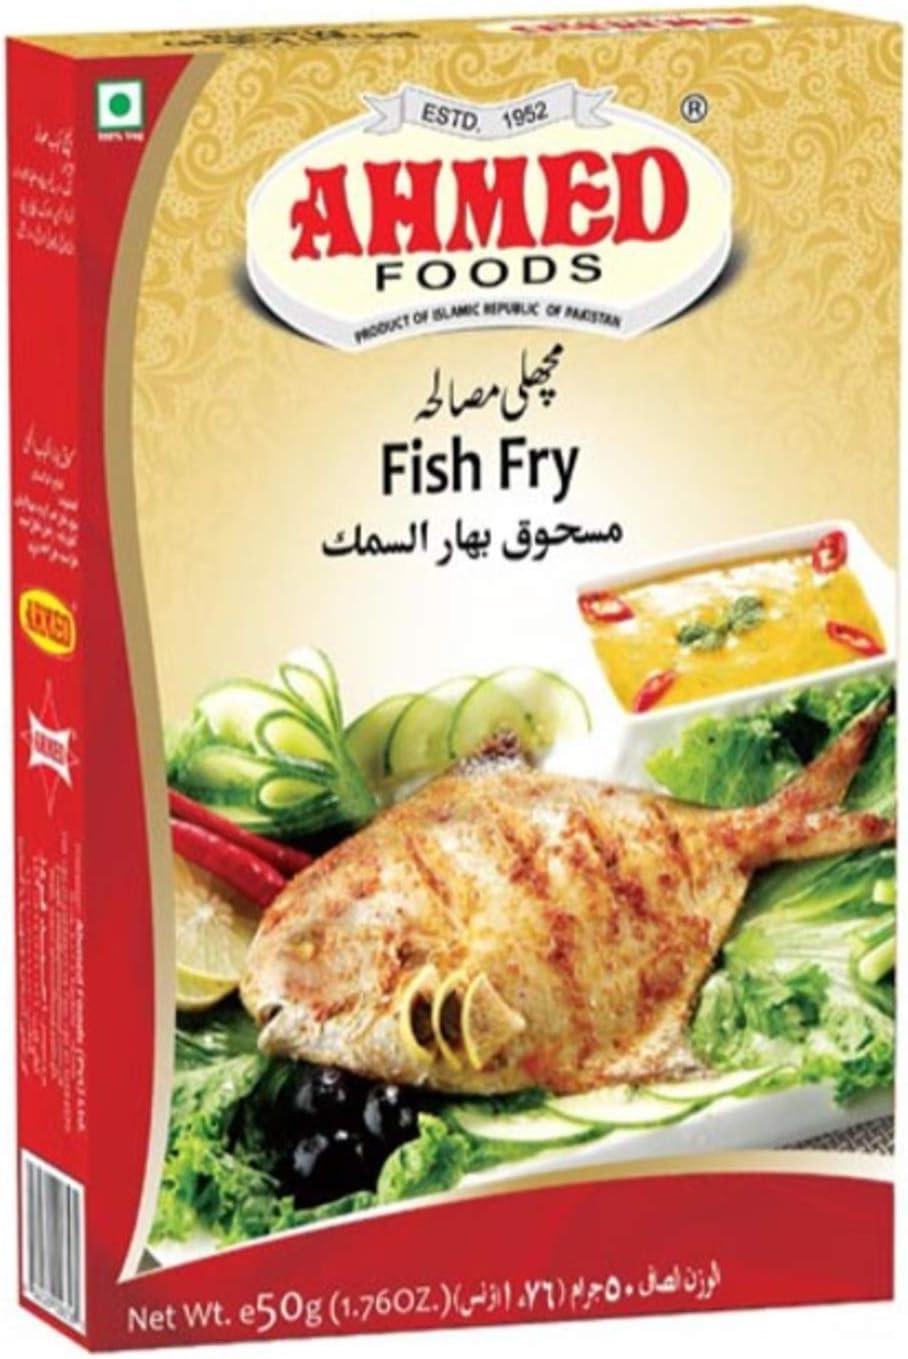 Ahmed Foods Fish Fry Masala 50g Amazon Co Uk Grocery